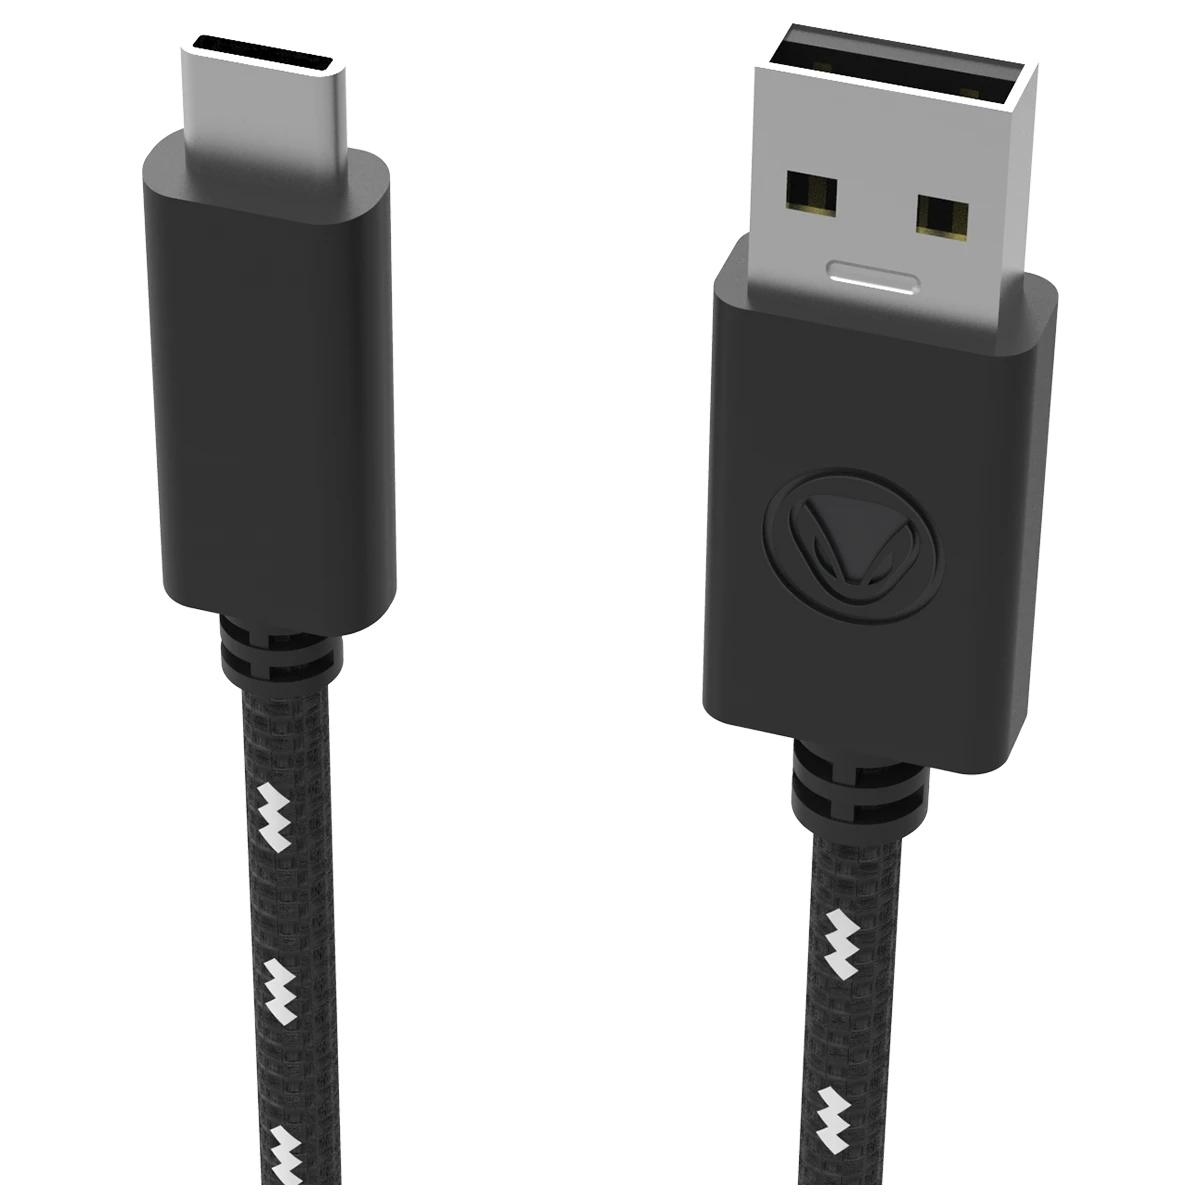 SnakeByte SONY PS5 USBケーブル CHARGE:CABLE 5 PRO™(5M)チャージ:ケーブル プロ 5 最新ゲーム機対応のUSBケーブル